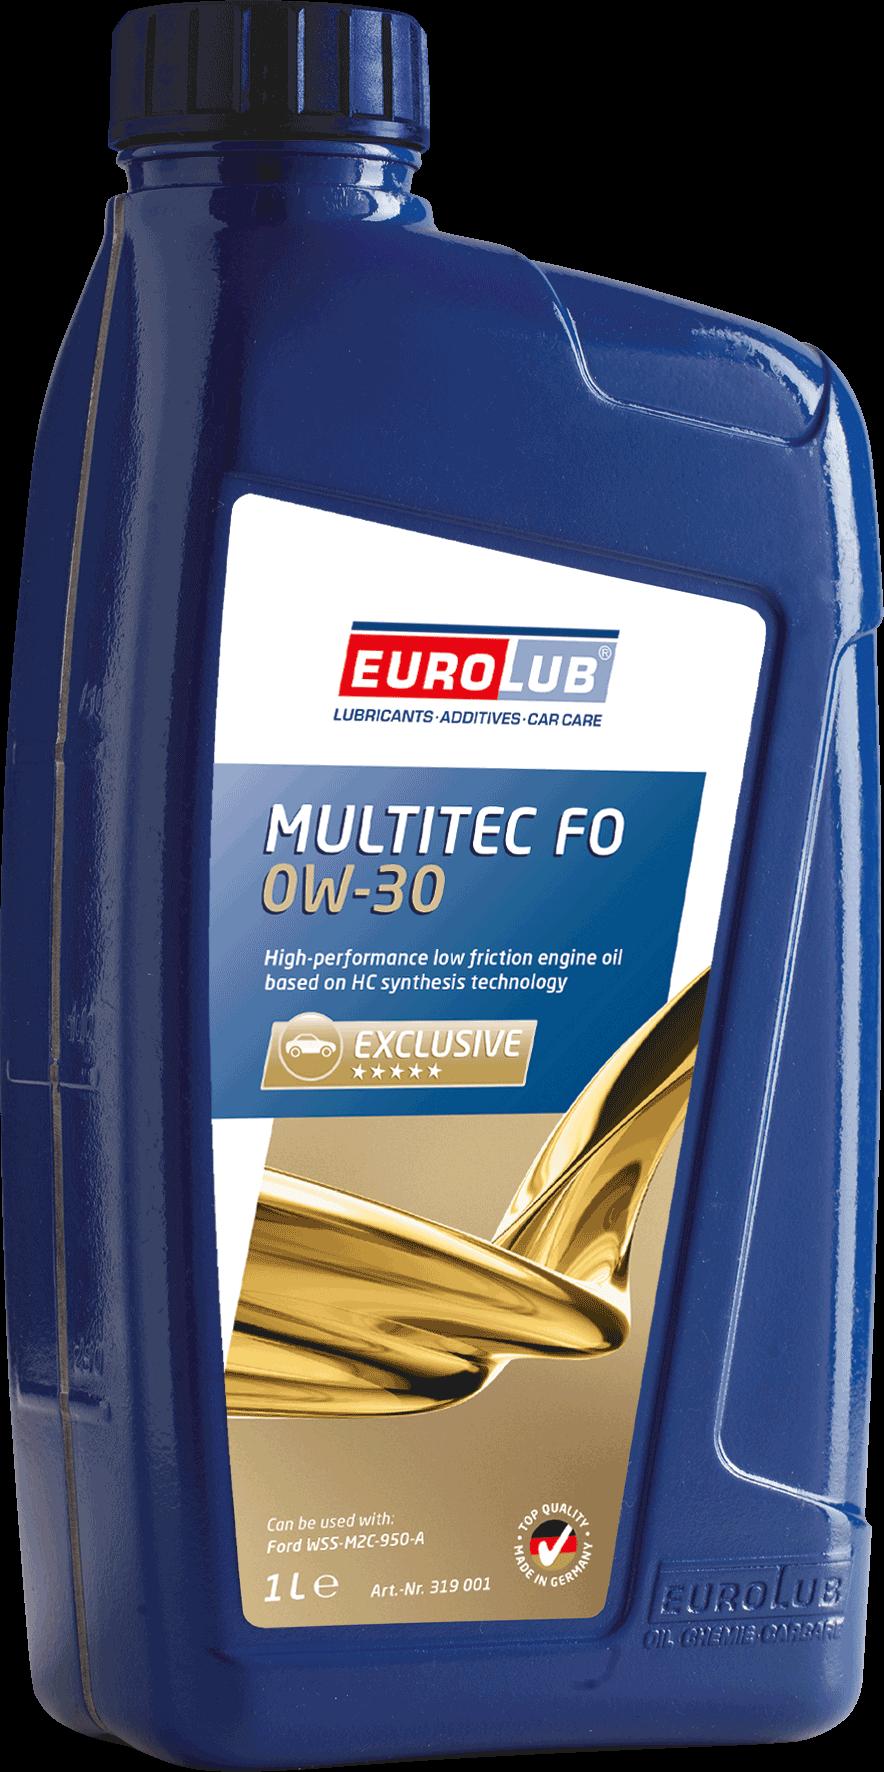 EUROLUB ECO MULTITEC FO SAE 0W/30 (синтетическое, Mid SAPS), 1л